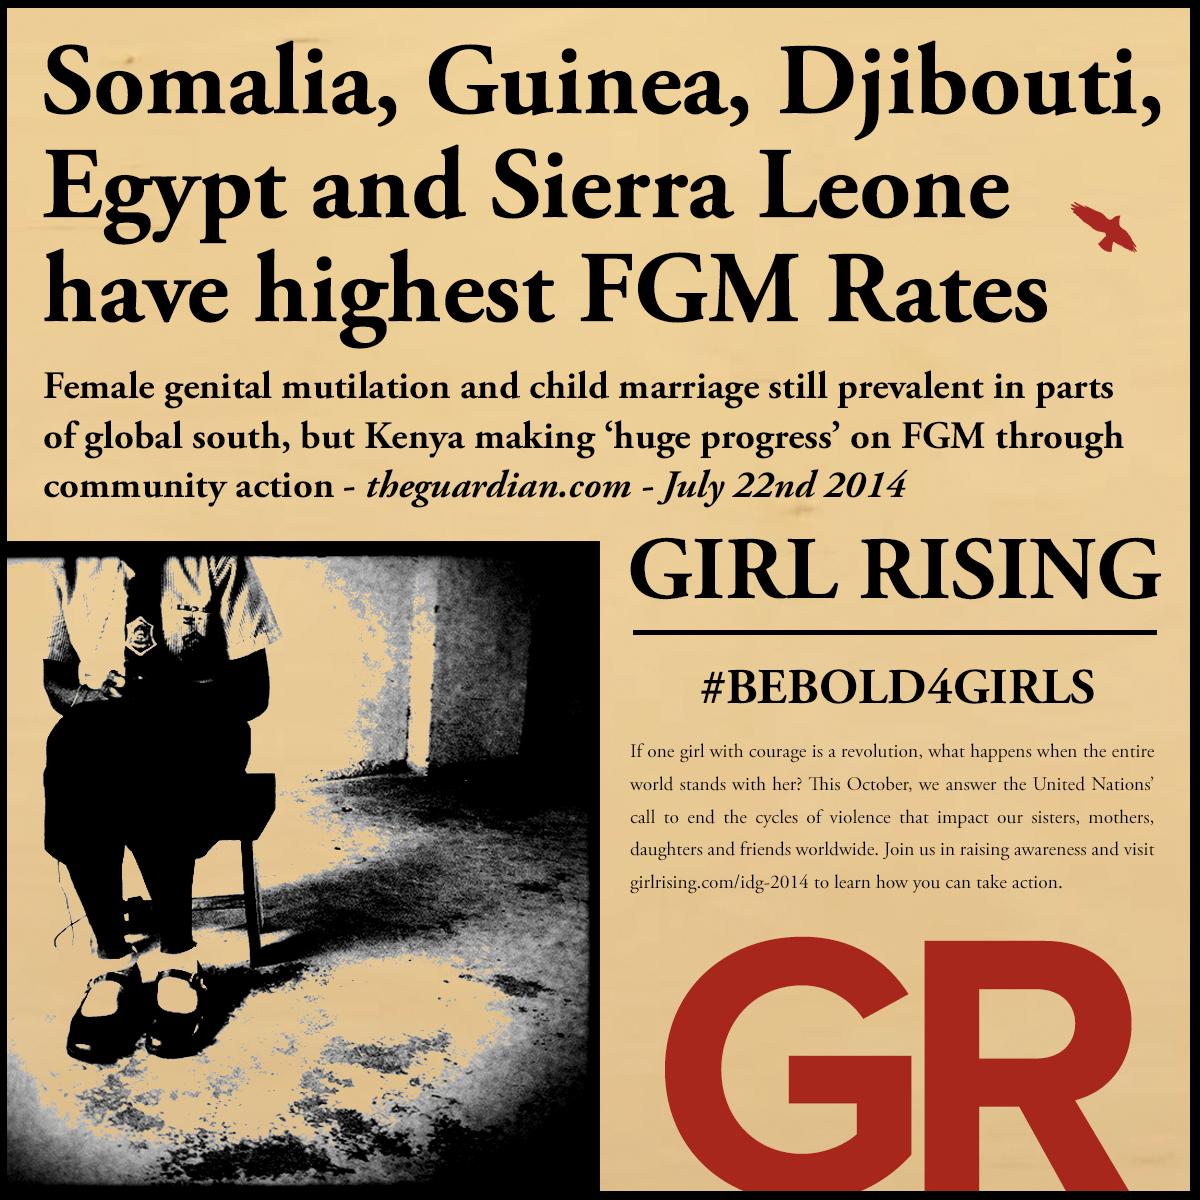 HC_FGM rates.jpg